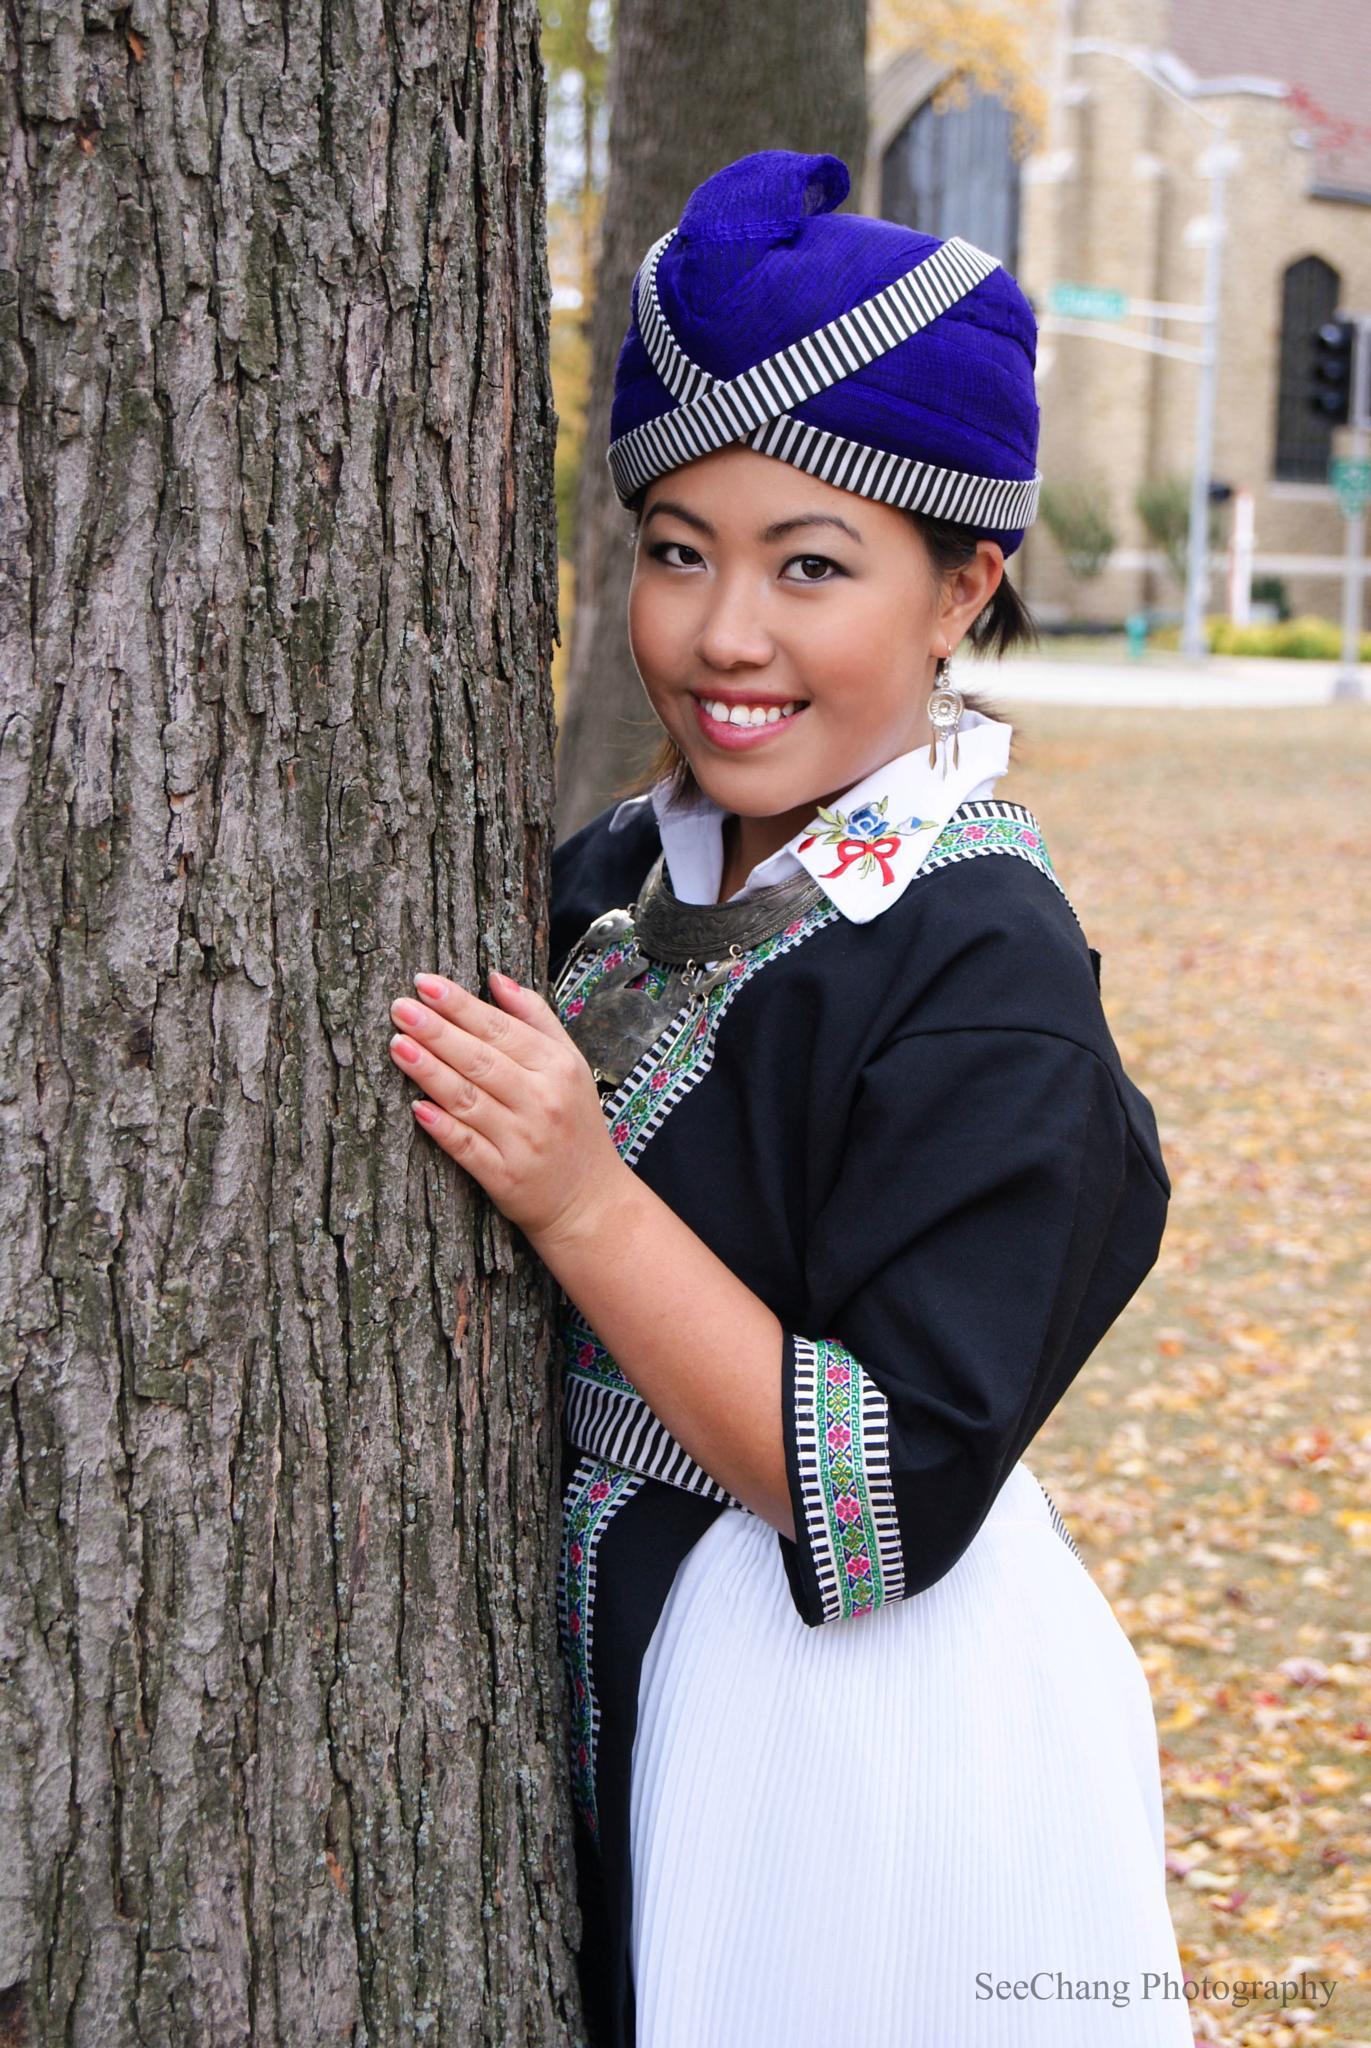 Hmong Beauty by SeeChang